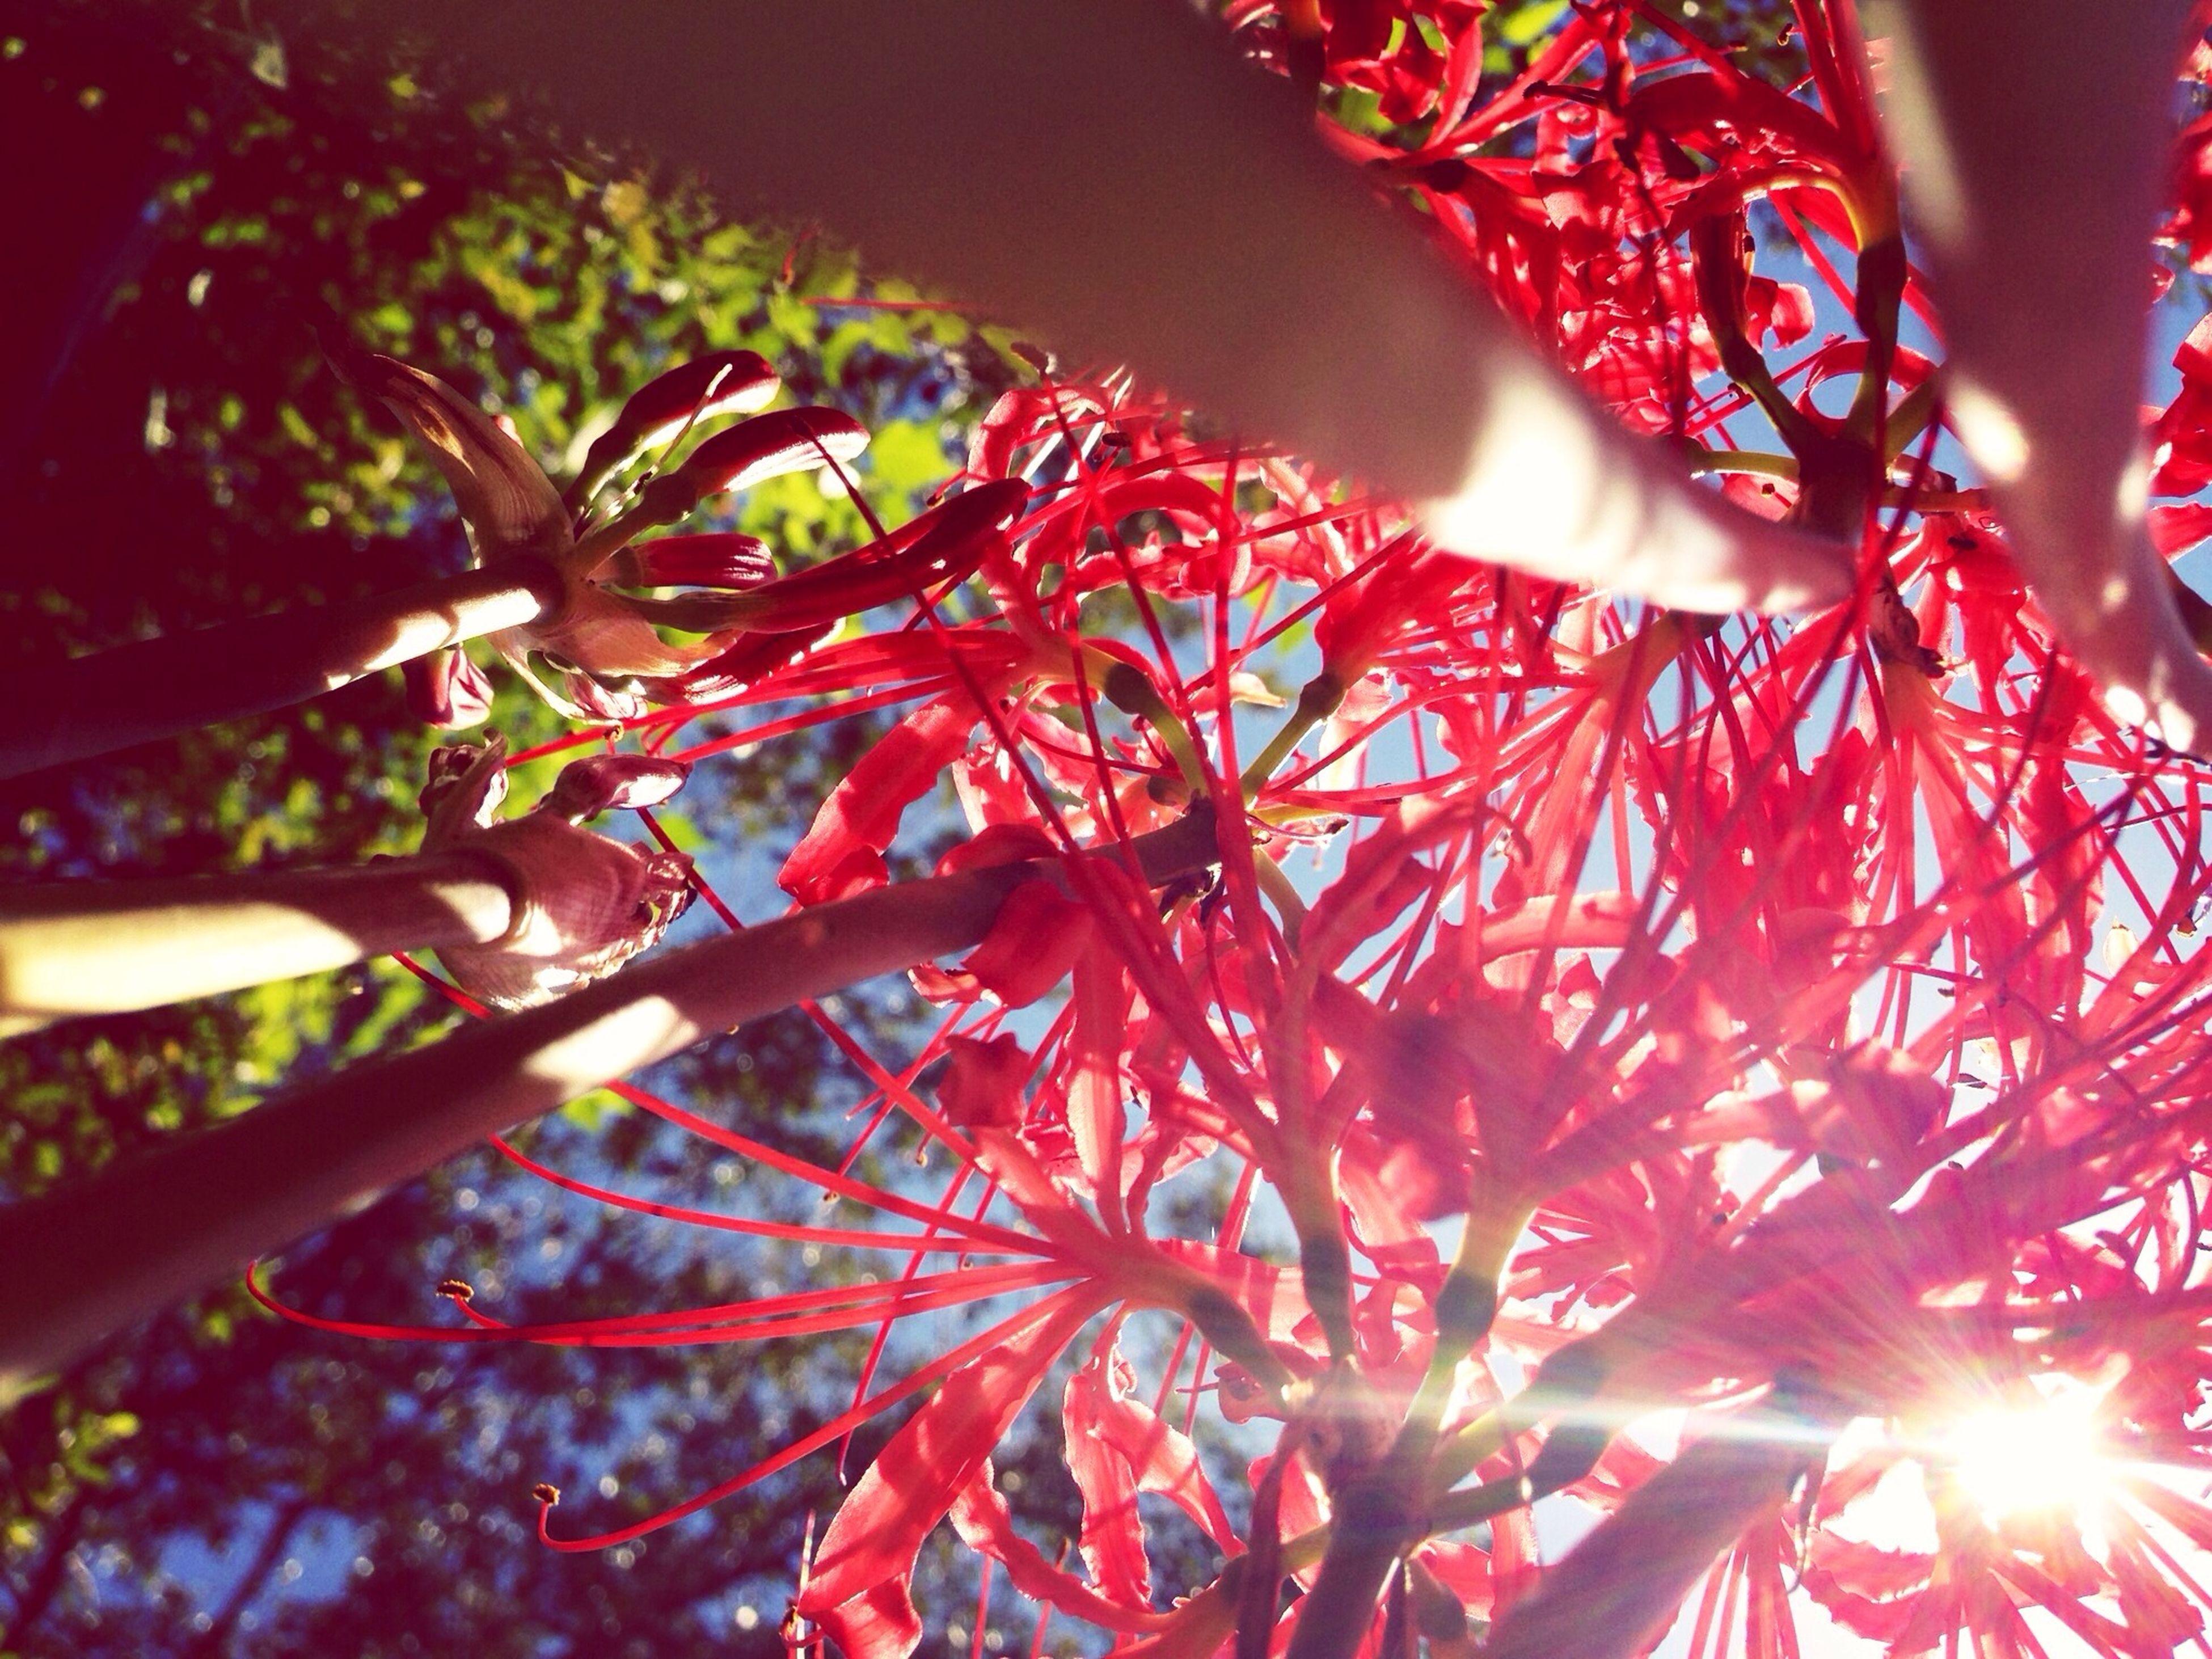 EyeEm Nature Lover Flowerporn A Bug's View Cluster Amaryllis